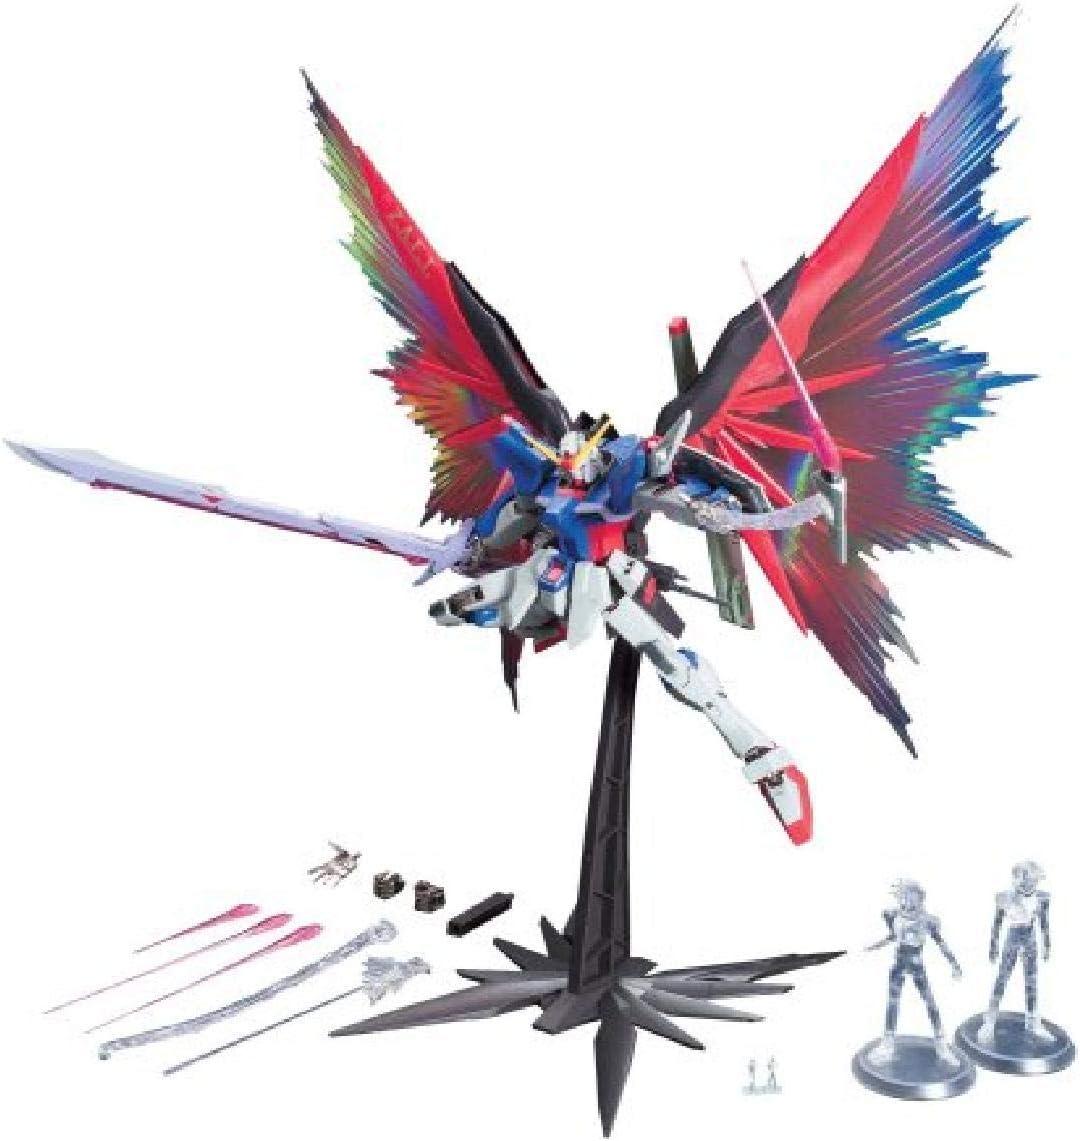 Bandai Hobby Extreme Blast Mode Mobile Suit Gundam Seed Destiny Model Kit (1/100 Scale) (BAN151244)